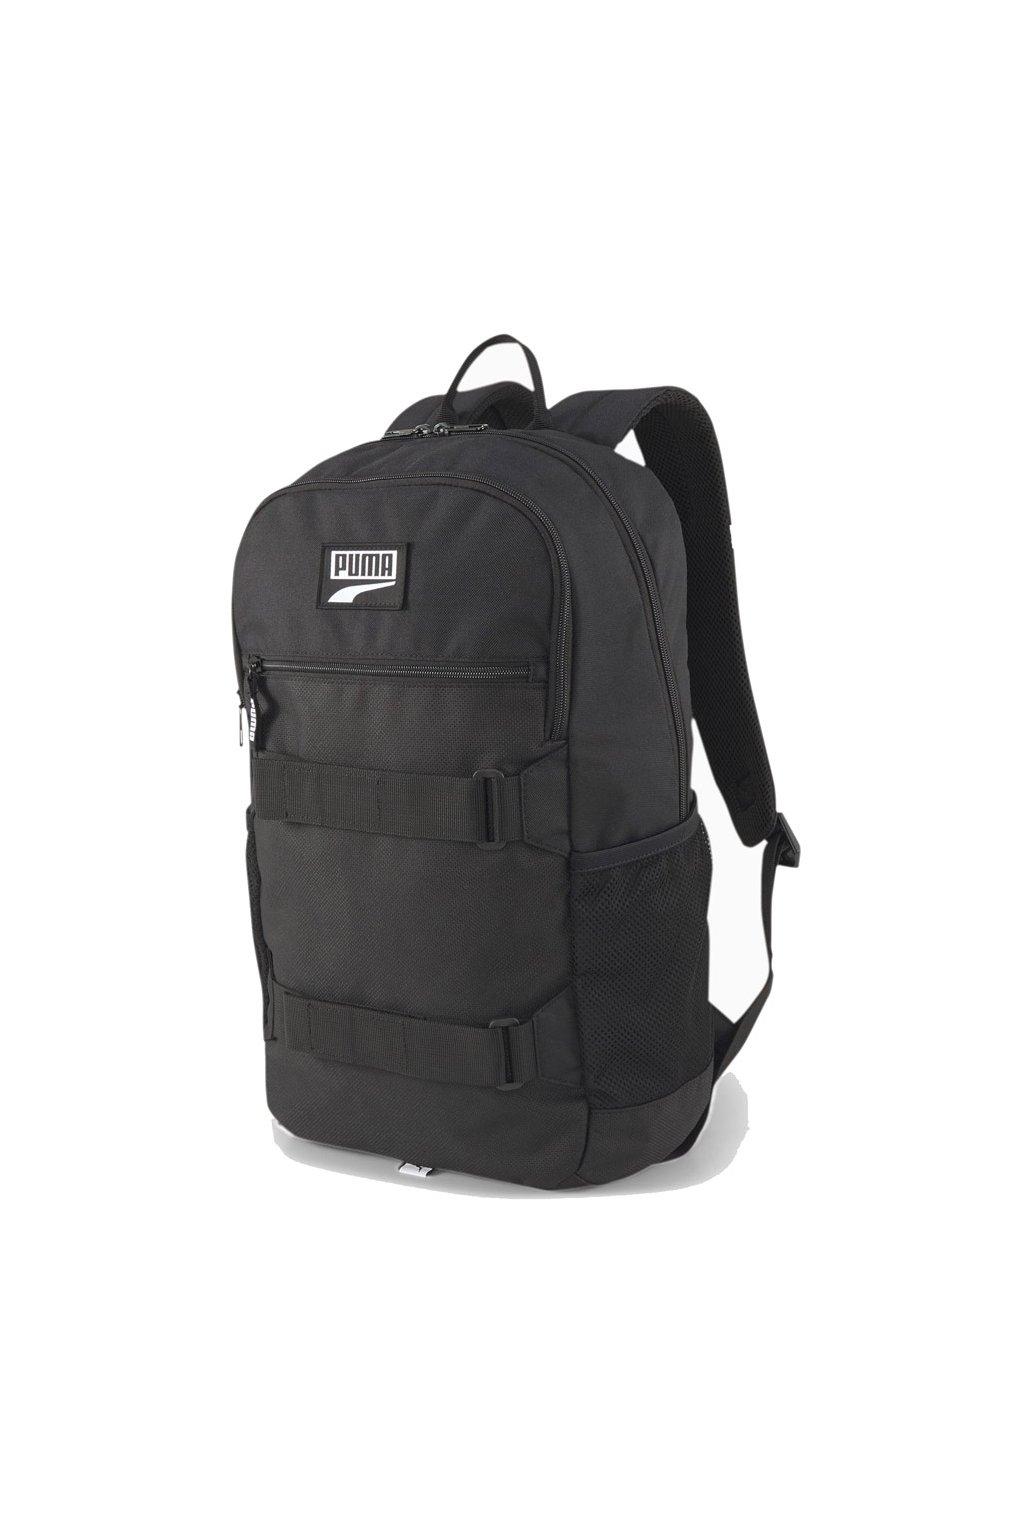 Batoh Puma Deck Backpack čierny 076905 01